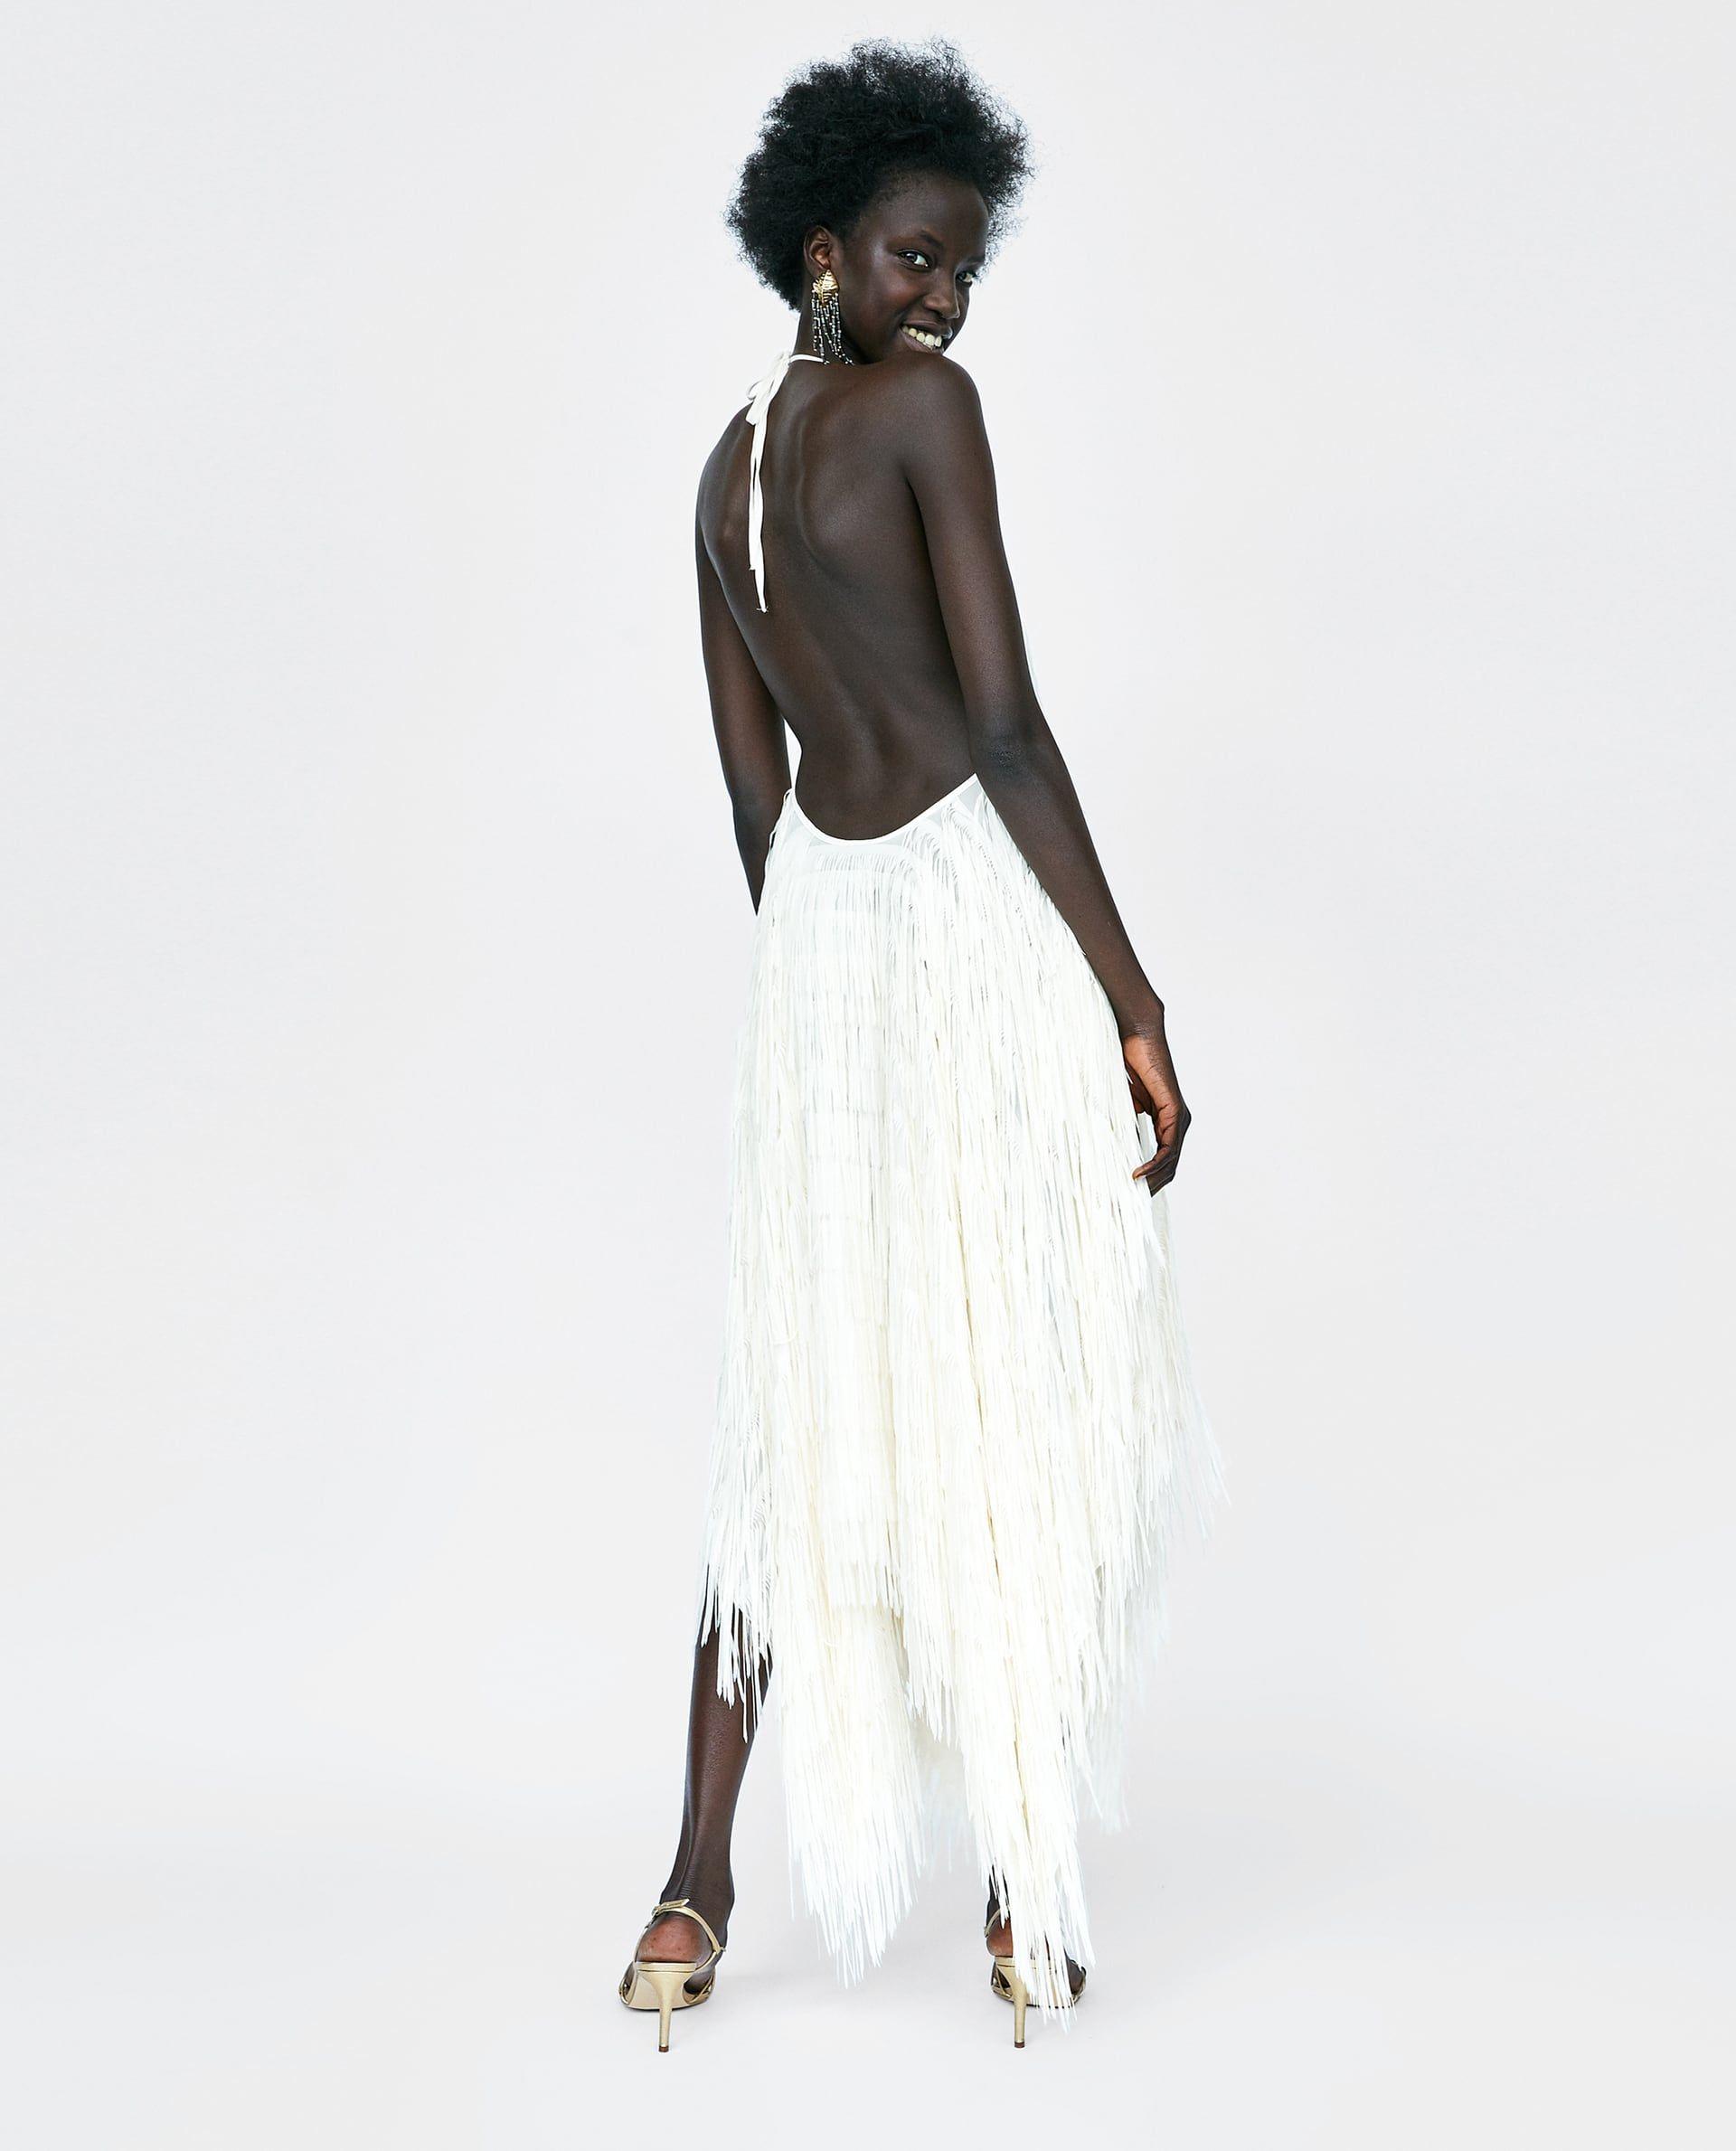 c198ca6d HALTER DRESS WITH FRINGING Fringe Dress, Zara United States, Lace Skirt,  Ootd,